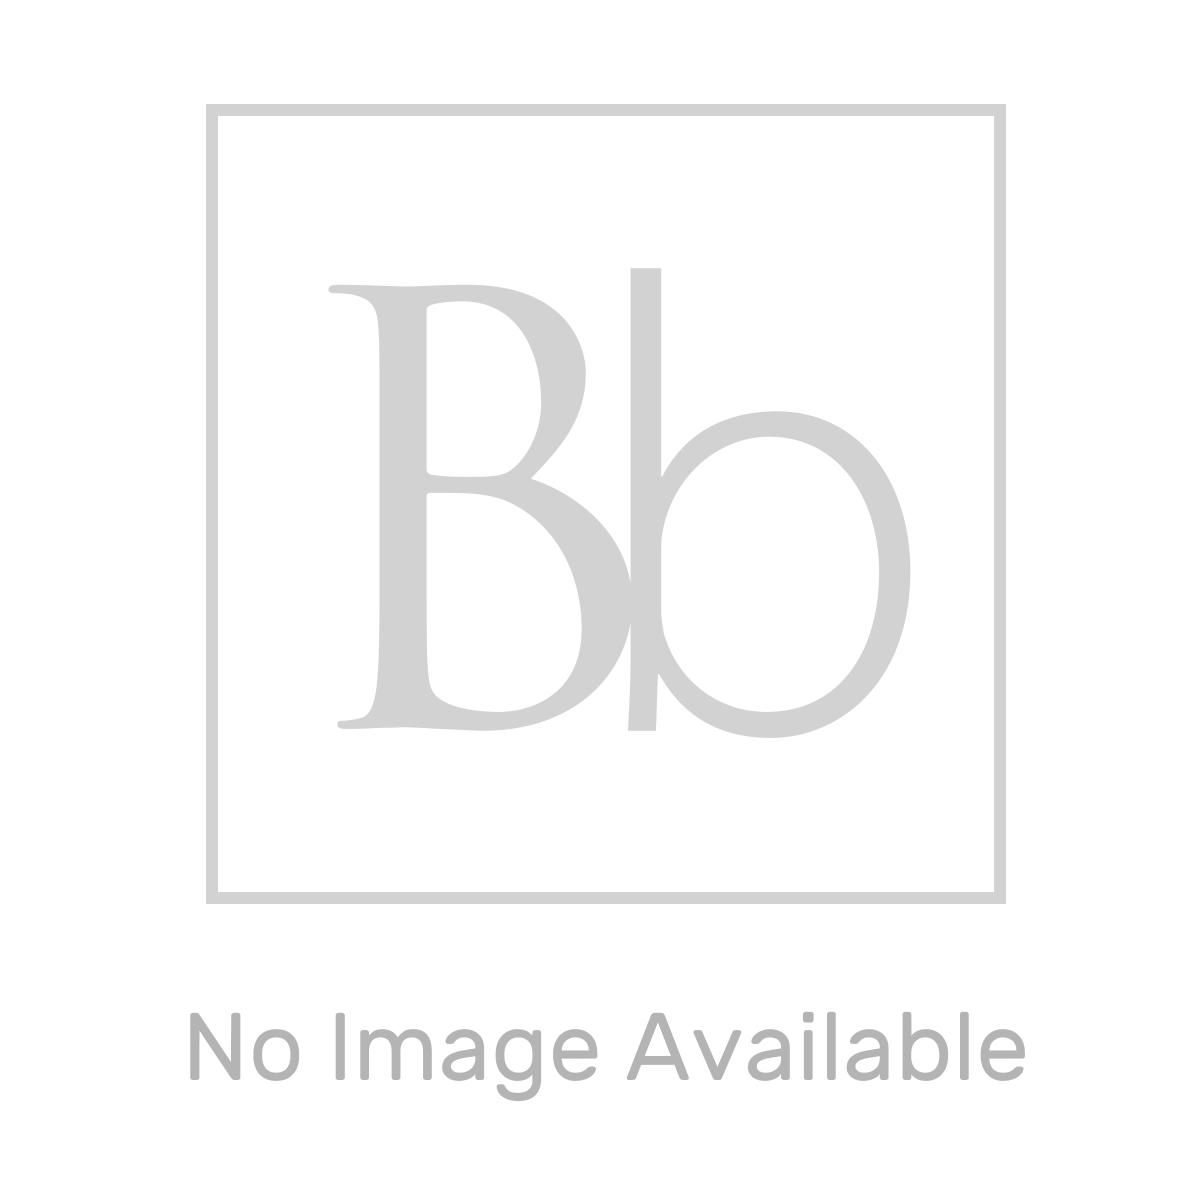 Kartell Impakt Vanity Unit 650mm Dimensions